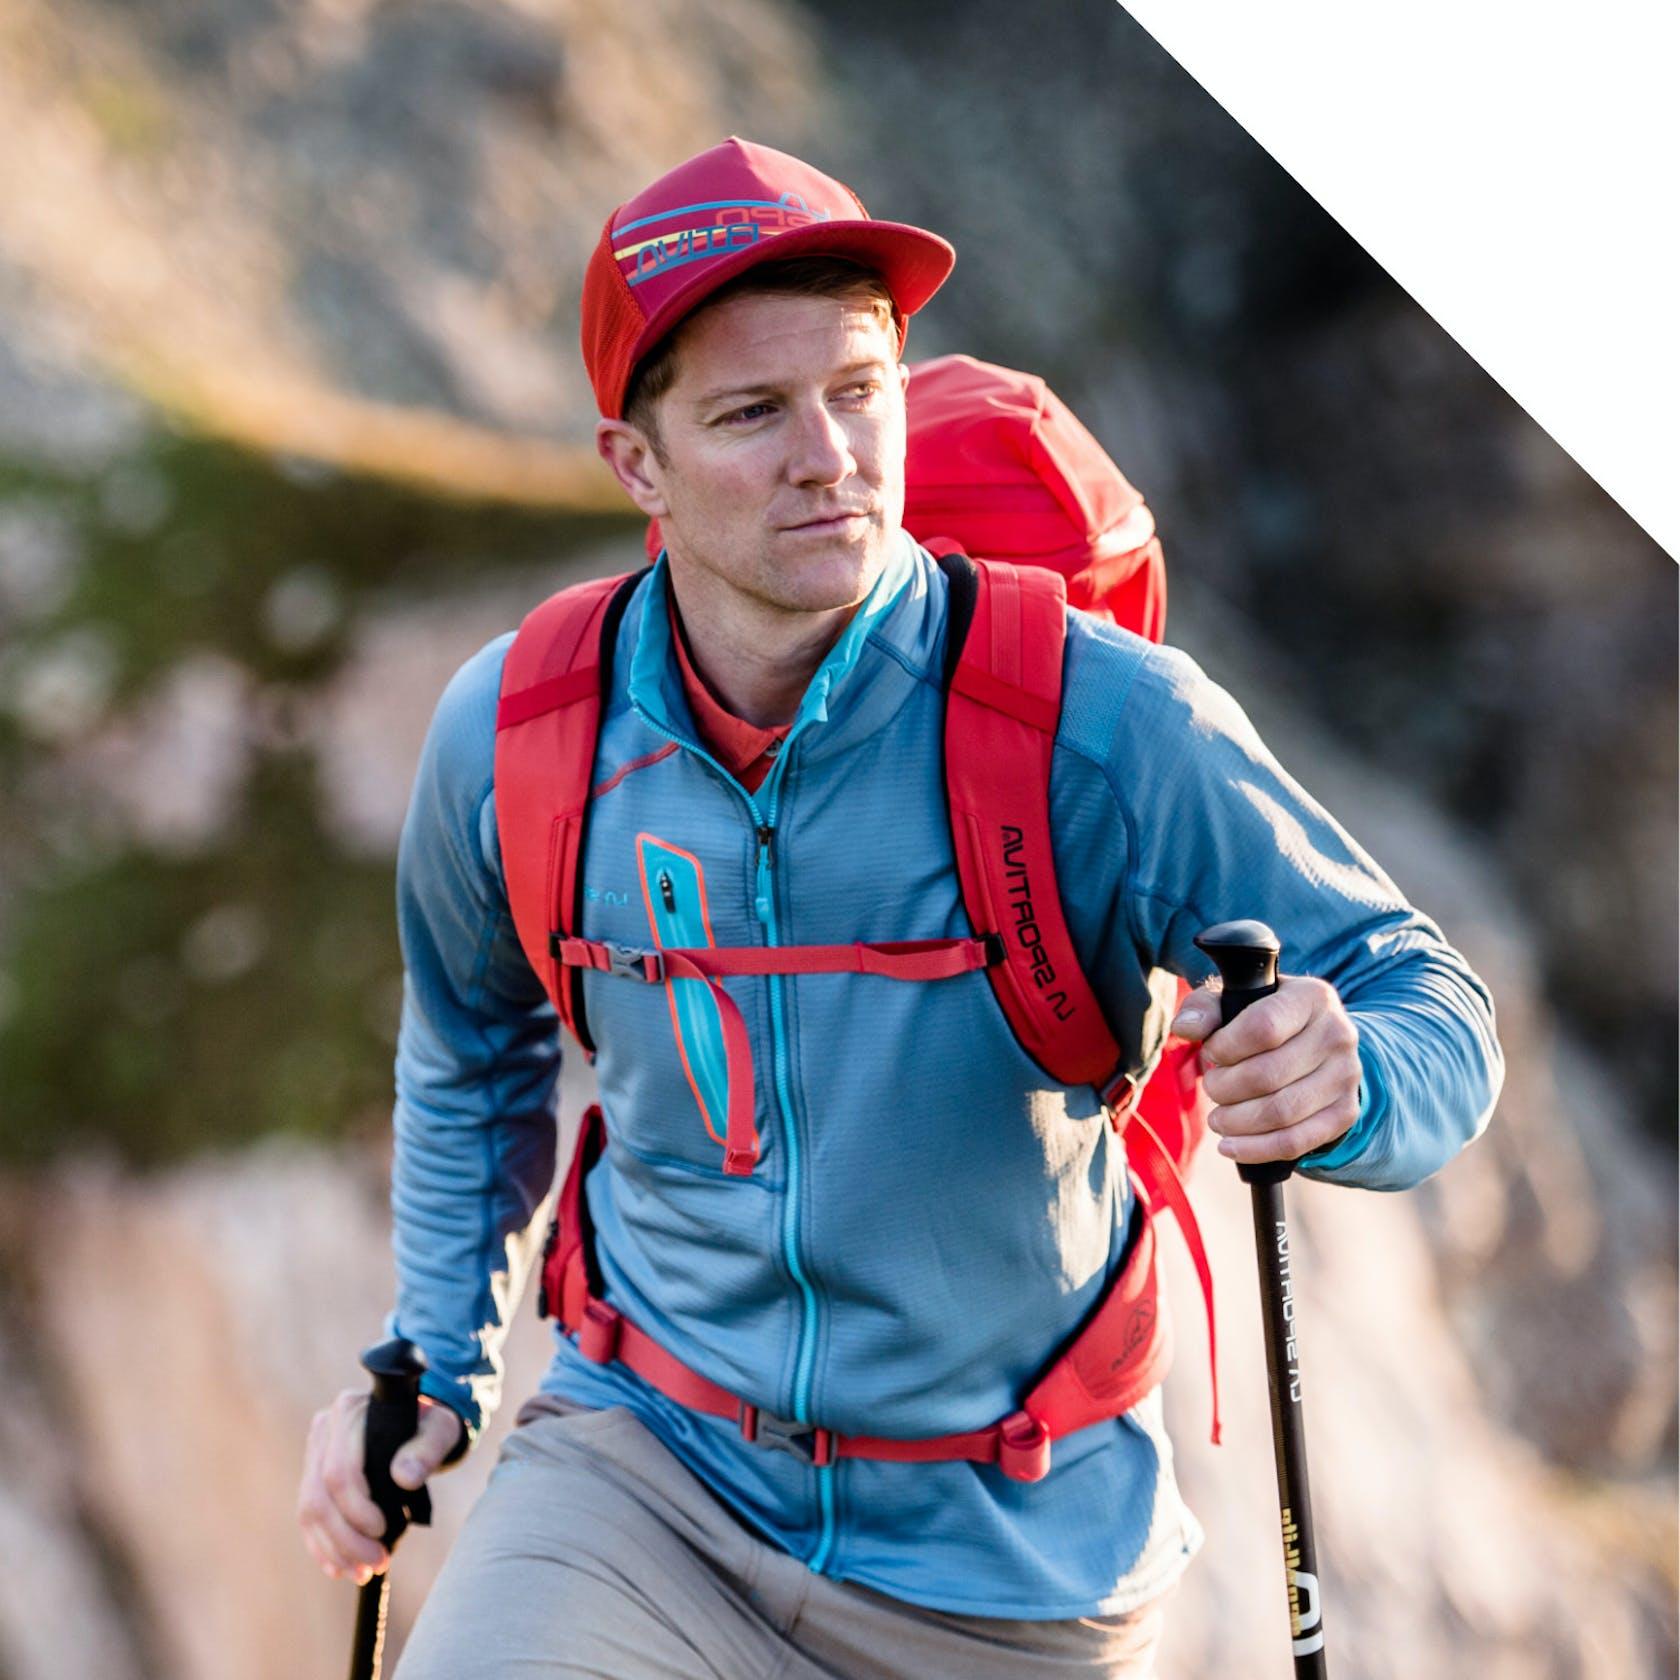 La Sportiva Bekleidung Bergsteigen für Herren